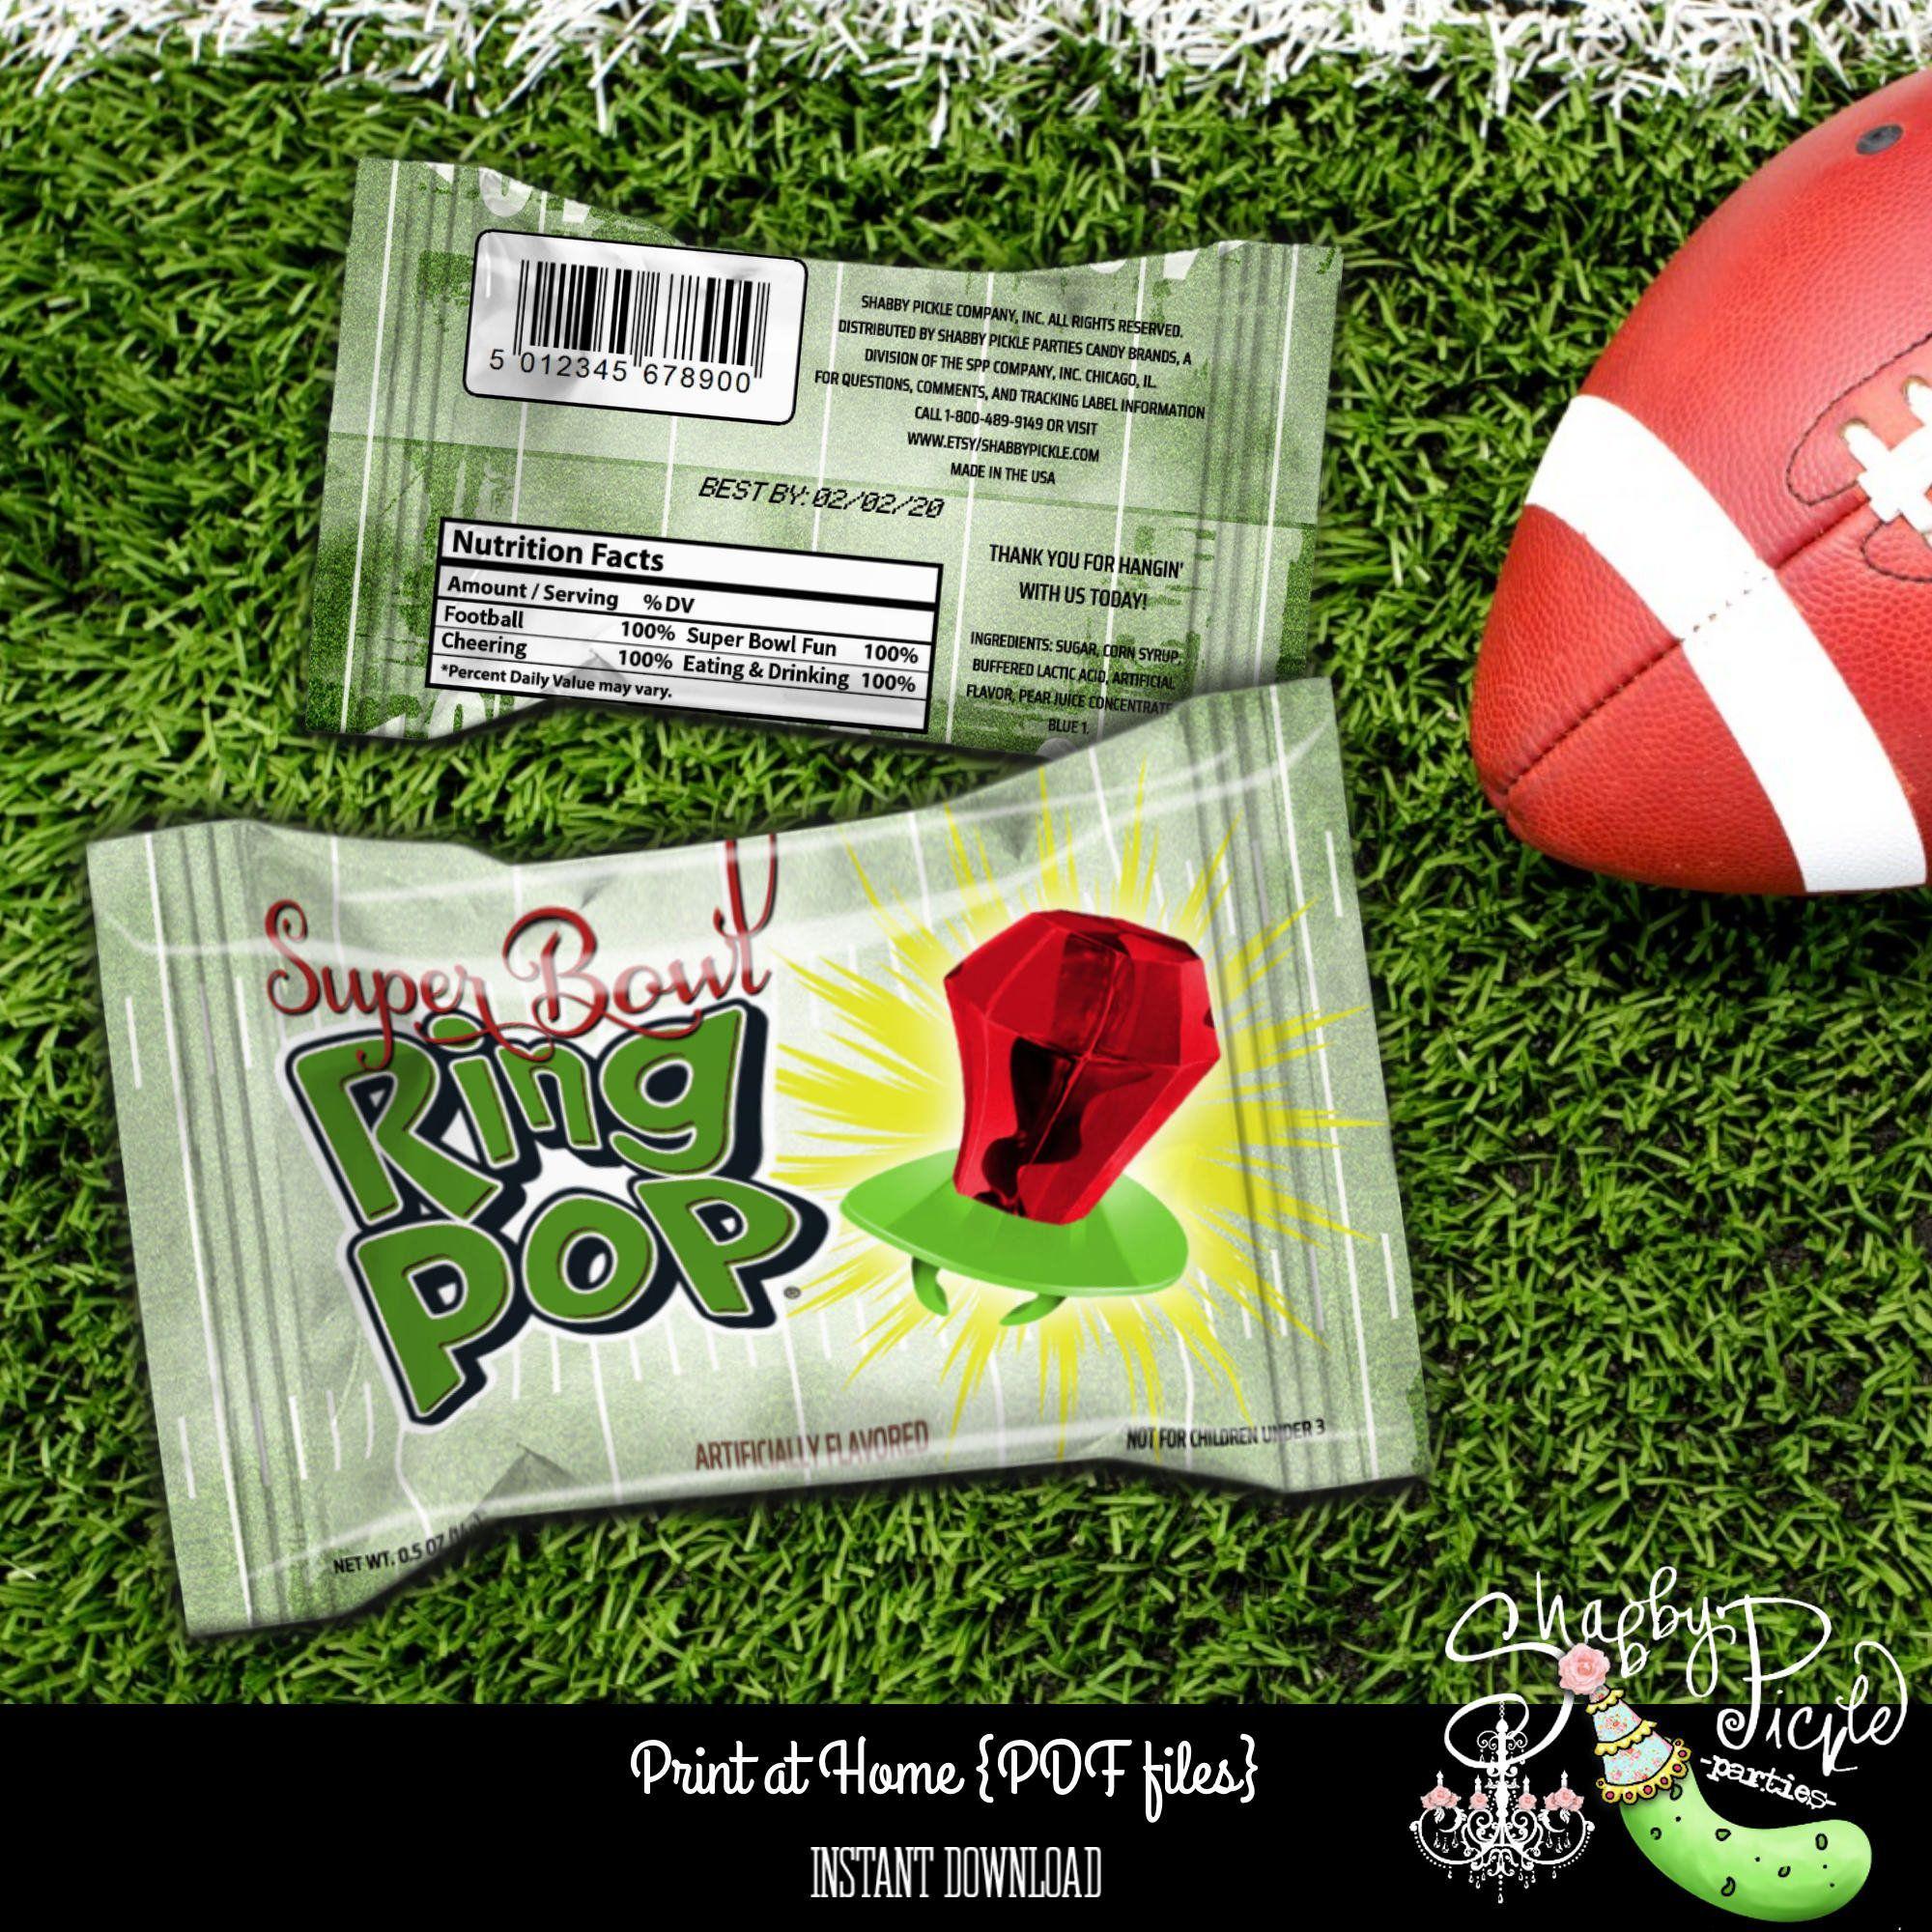 Vintage Football Super Bowl Ring Ring Pop Wrapper Super Bowl Party Printable Superbowl Sunday Parties Super Bow In 2020 Super Bowl Football Super Bowl Vintage Football